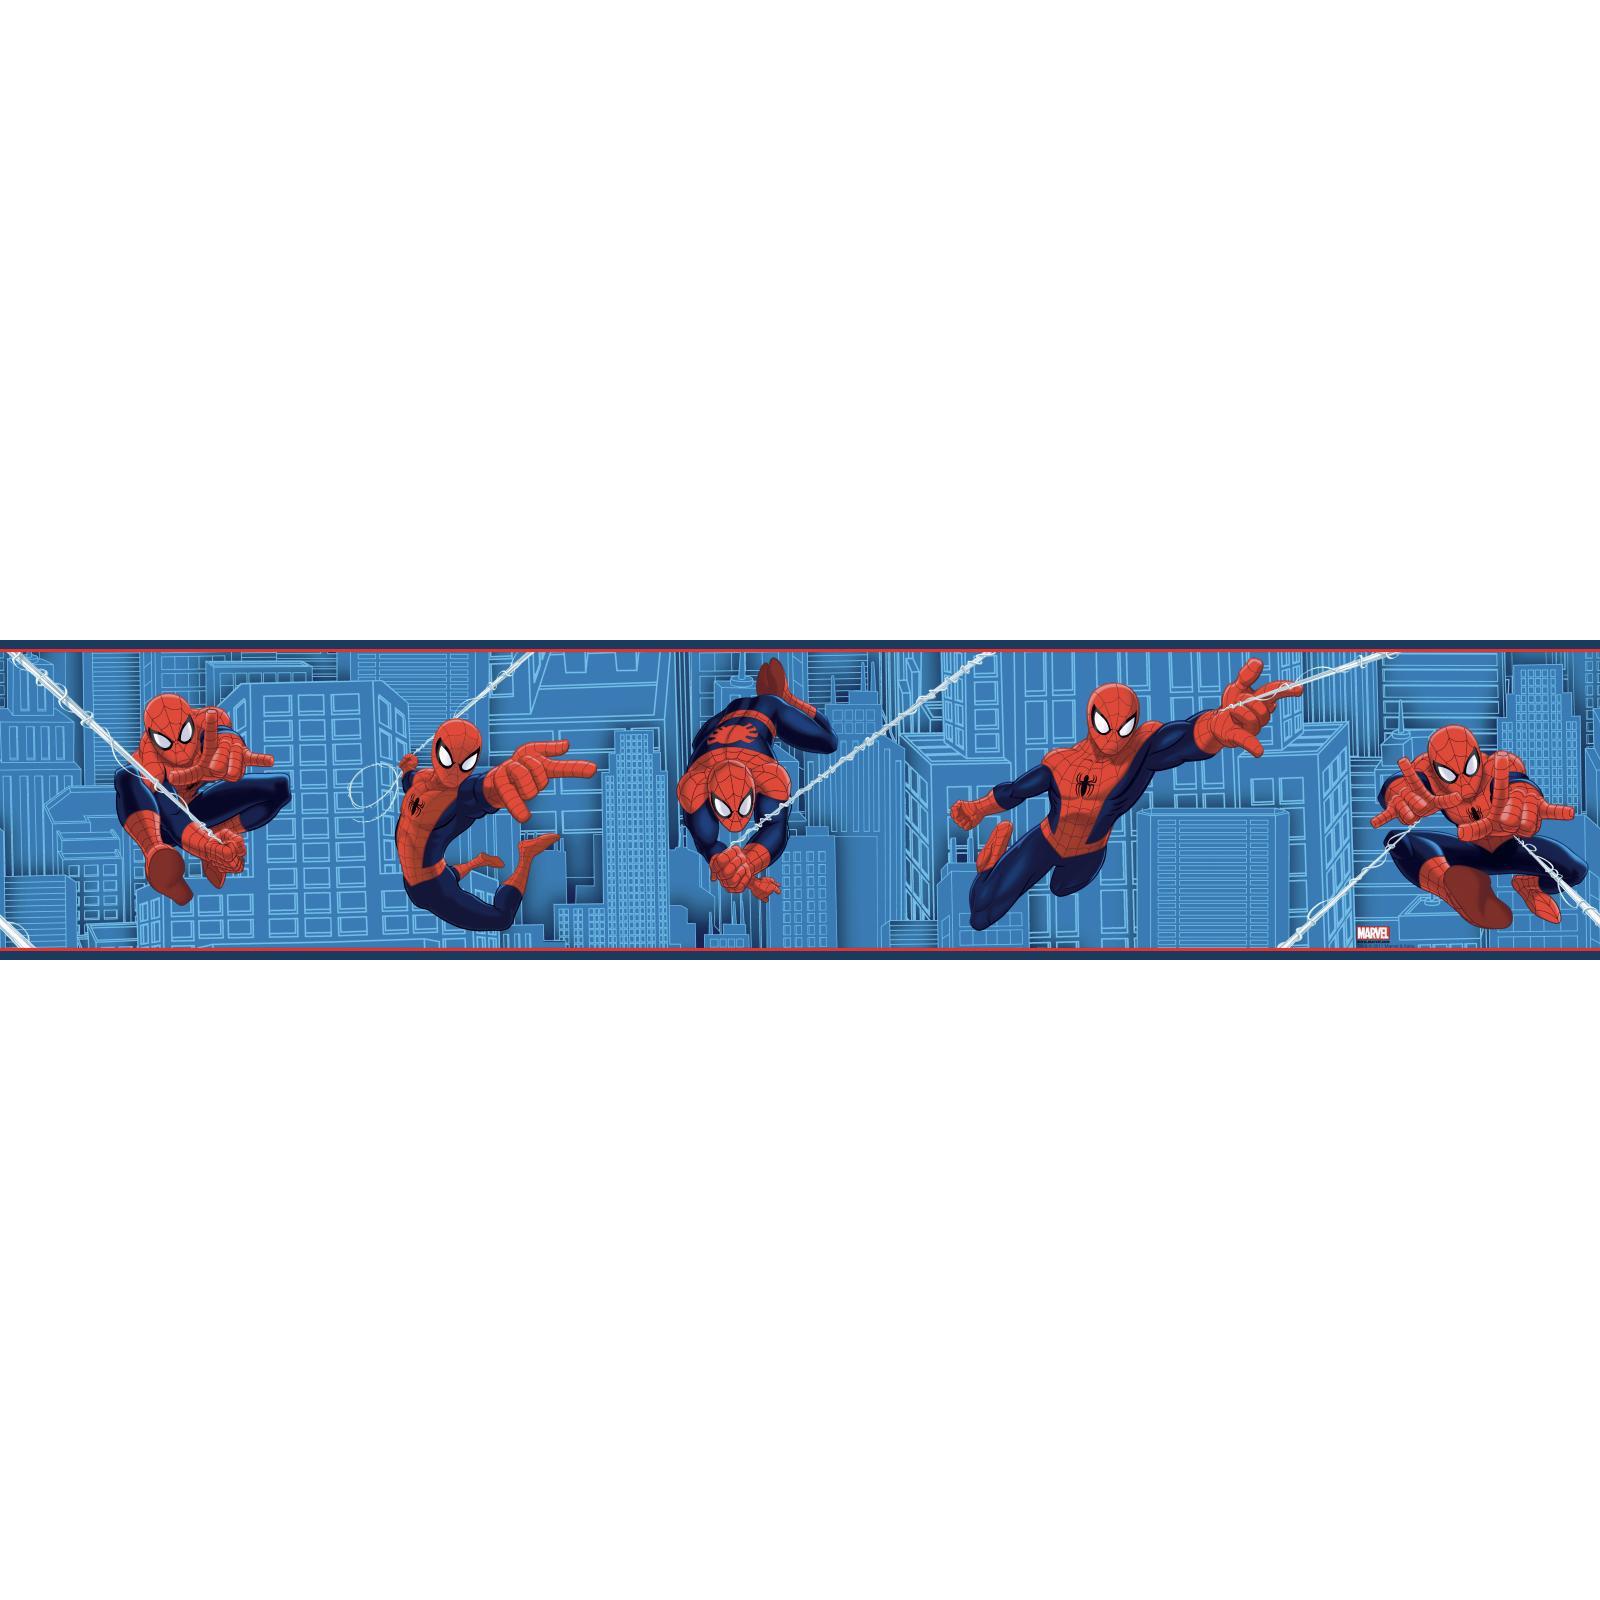 York Wallcoverings Walt Disney Kids II Road Wallpaper Memo Sample White//Bright Blue//Red//Yellow//Black 8-Inch x 10-Inch